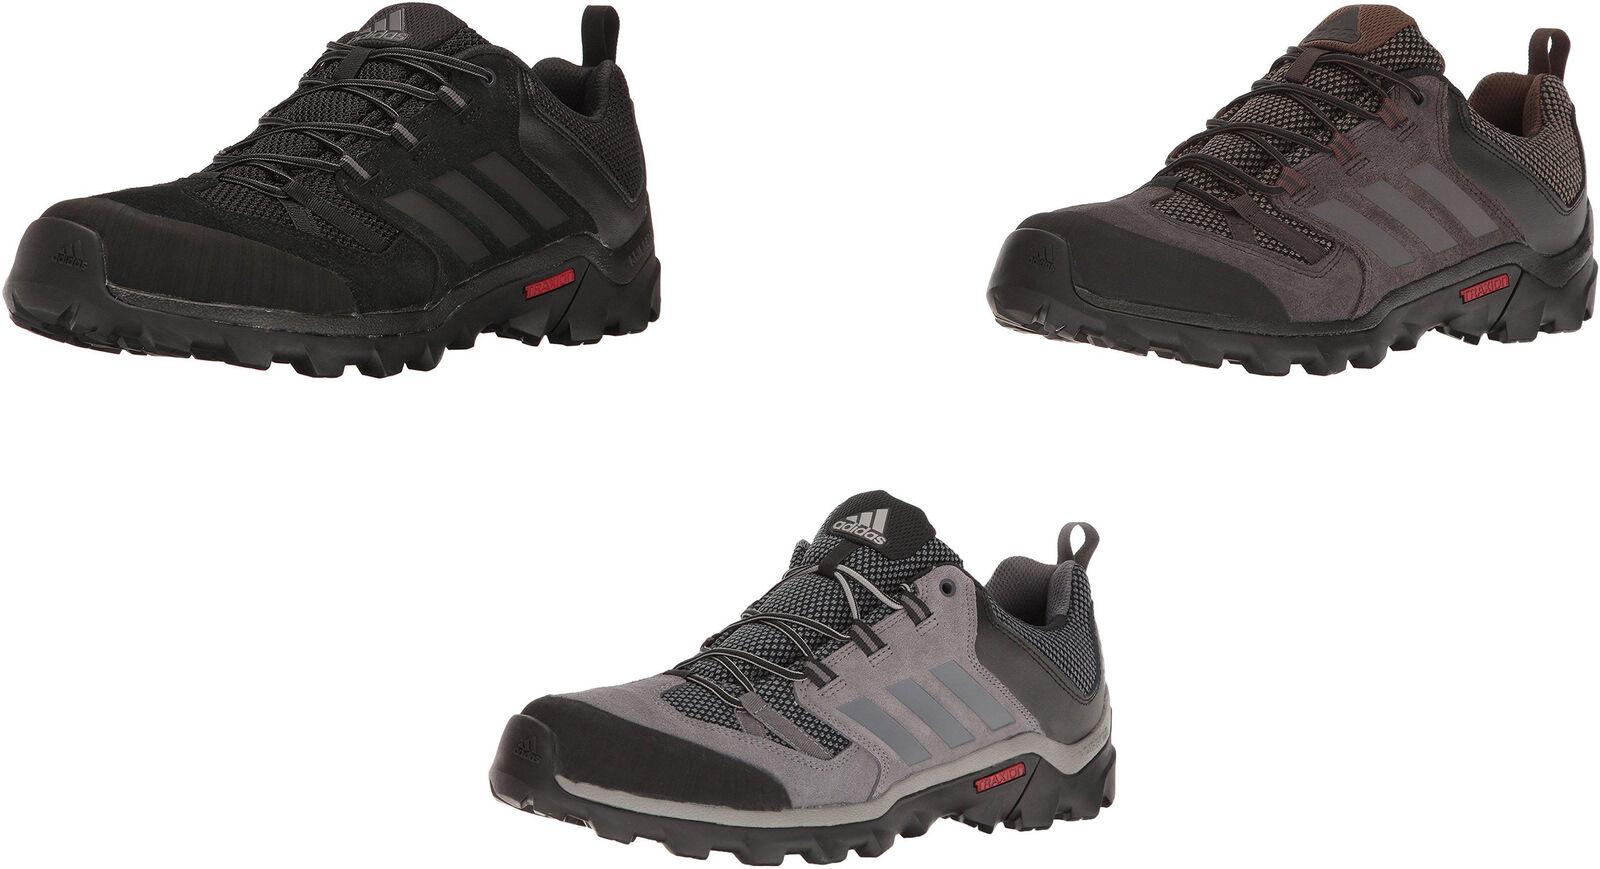 hot sale online e9ea7 b295c adidas outdoor Mens Caprock Hiking Shoes, 3 Colors